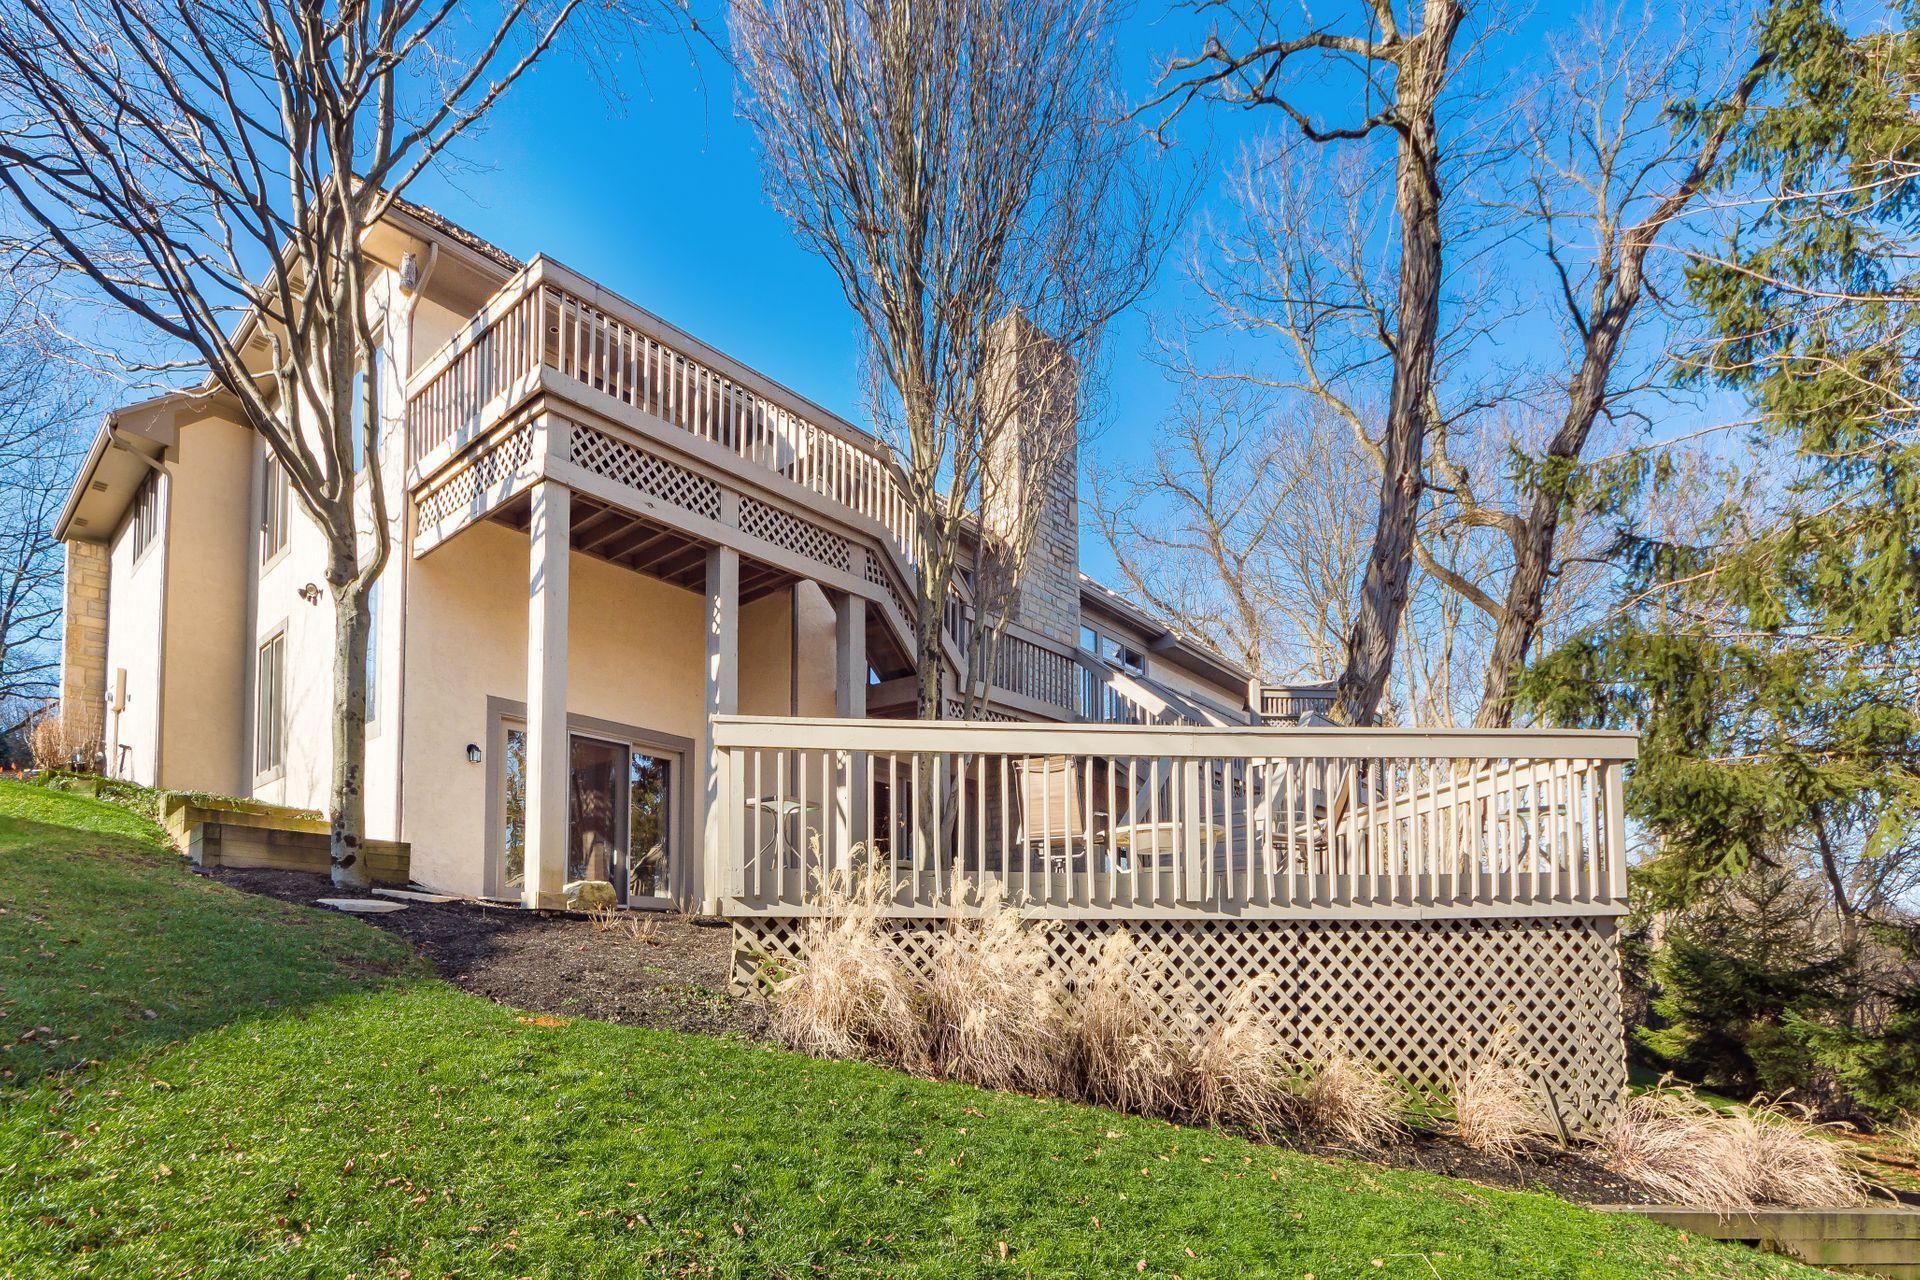 718 Old Oak, Columbus, Ohio 43235, 3 Bedrooms Bedrooms, ,3 BathroomsBathrooms,Residential,For Sale,Old Oak,221000035